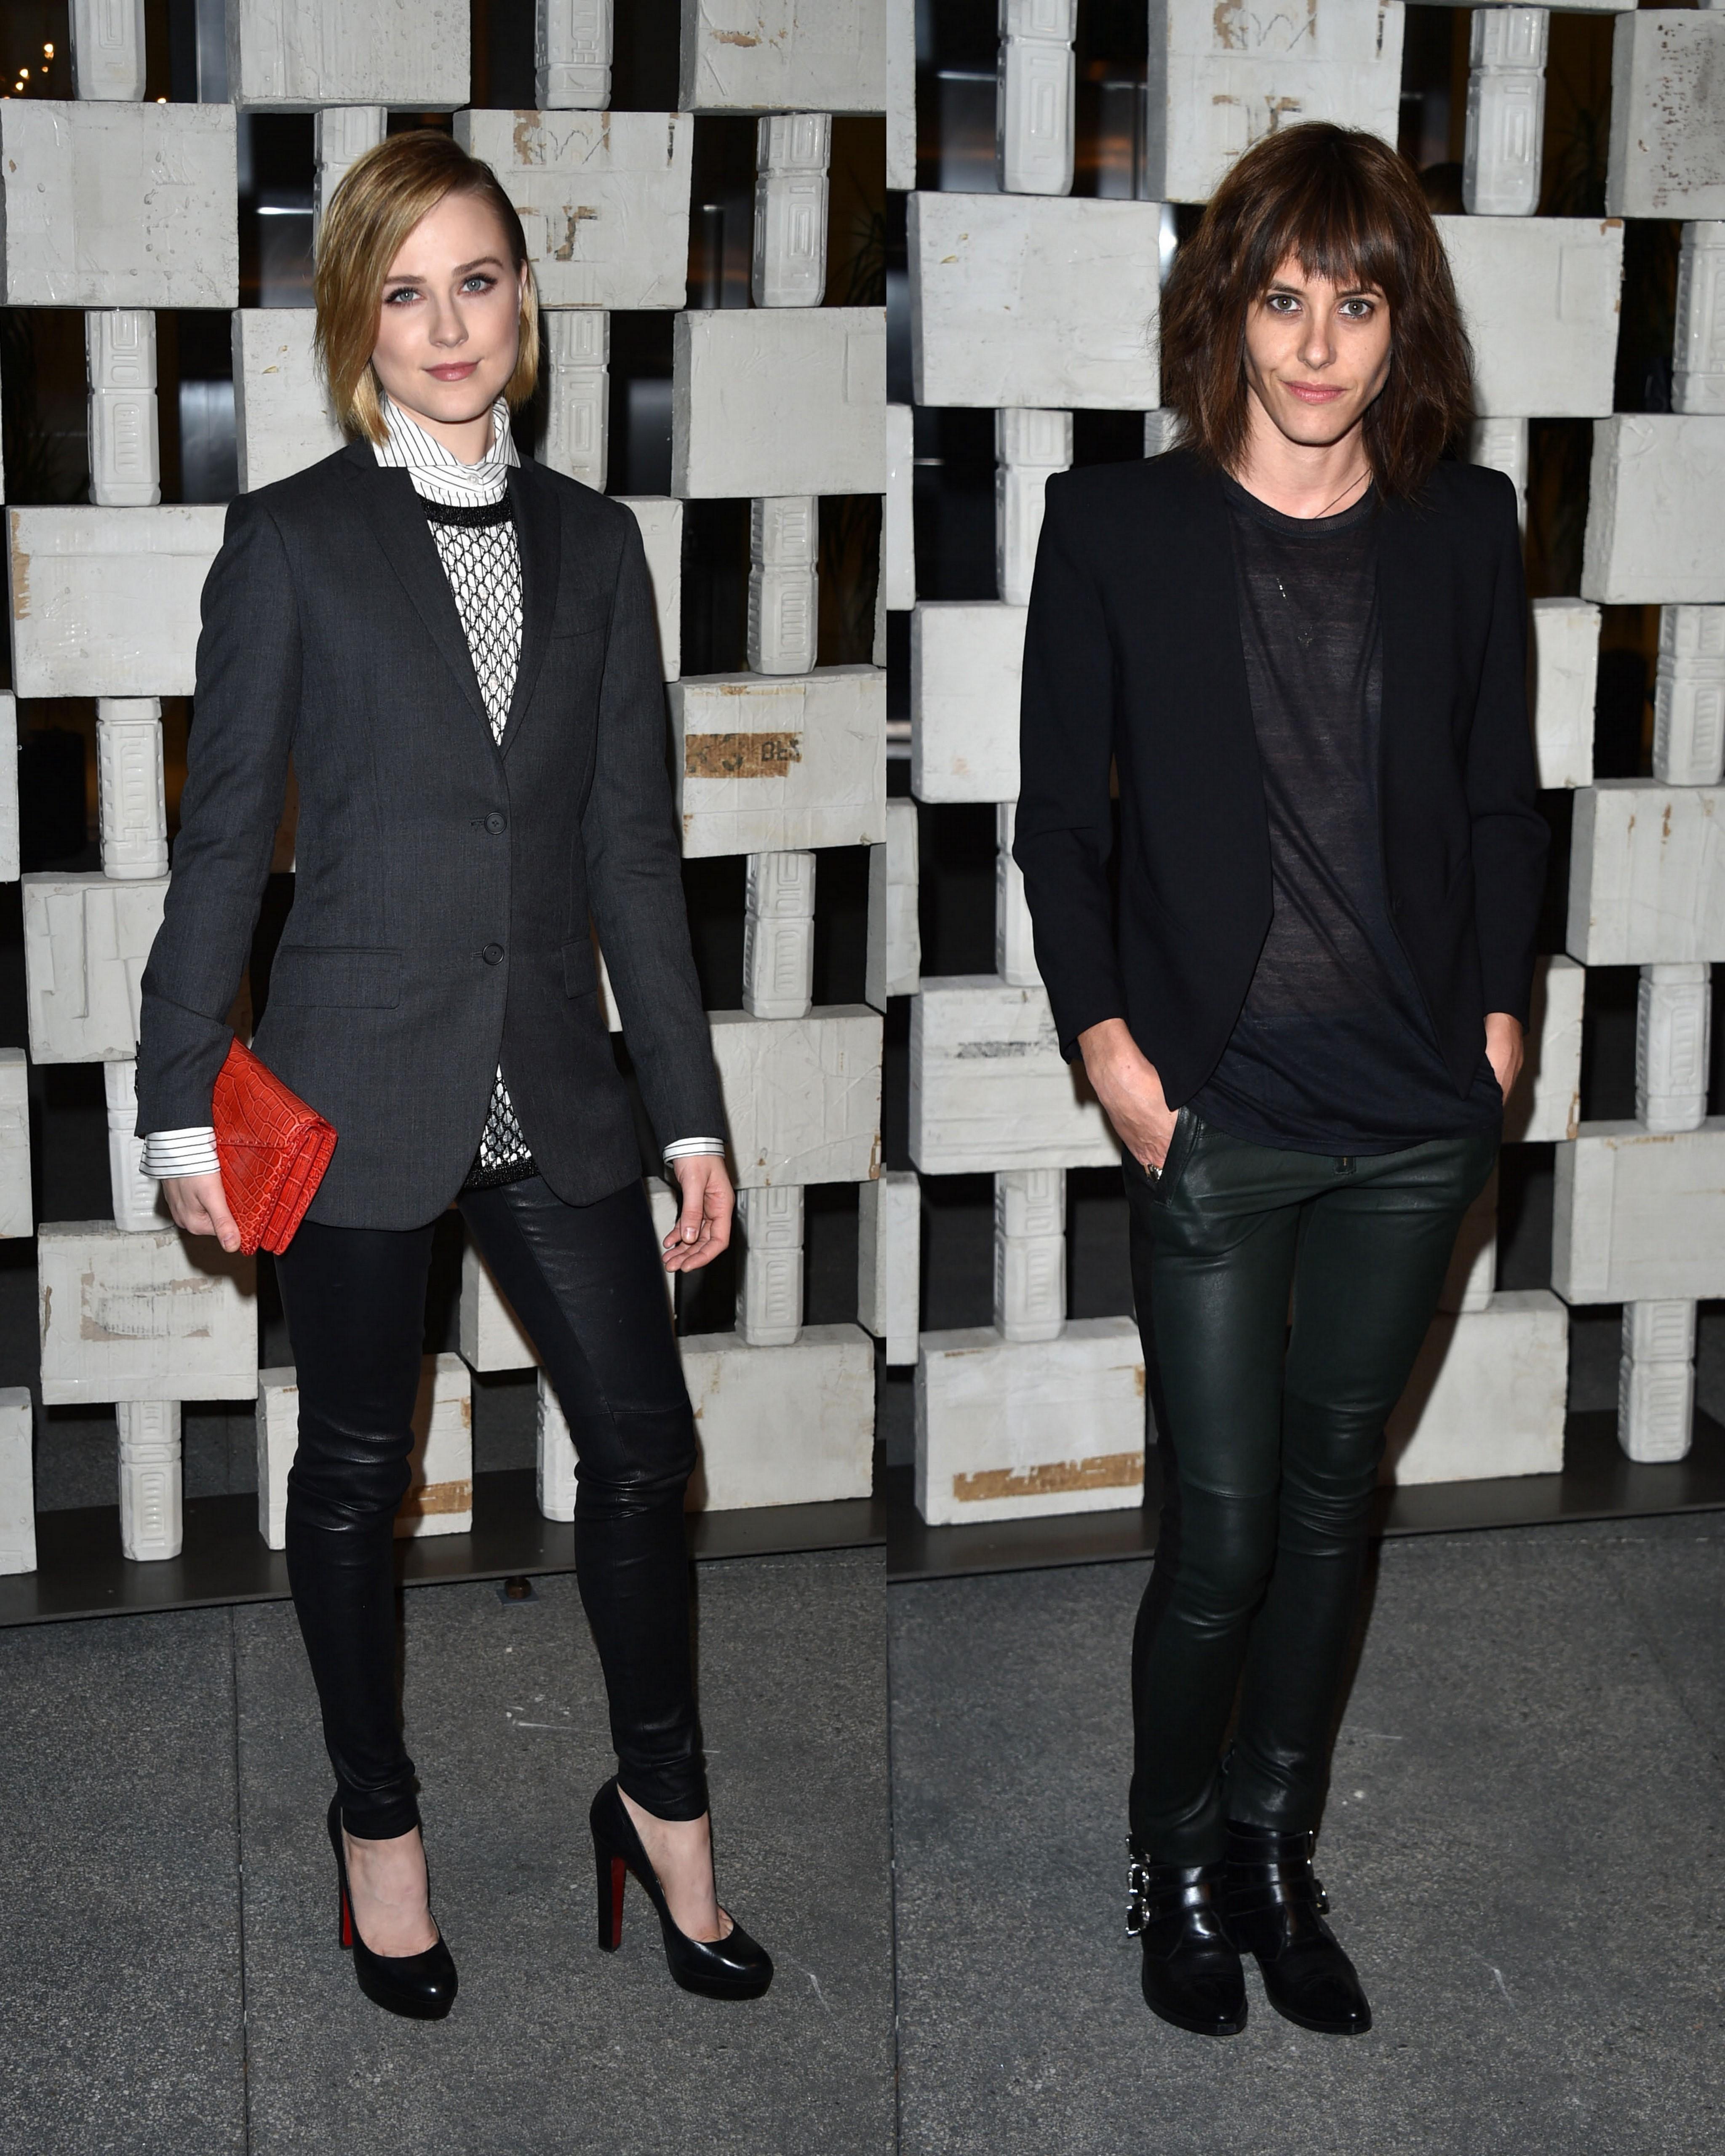 Evan Rachel Wood, Katherine Moennig spark romance rumors